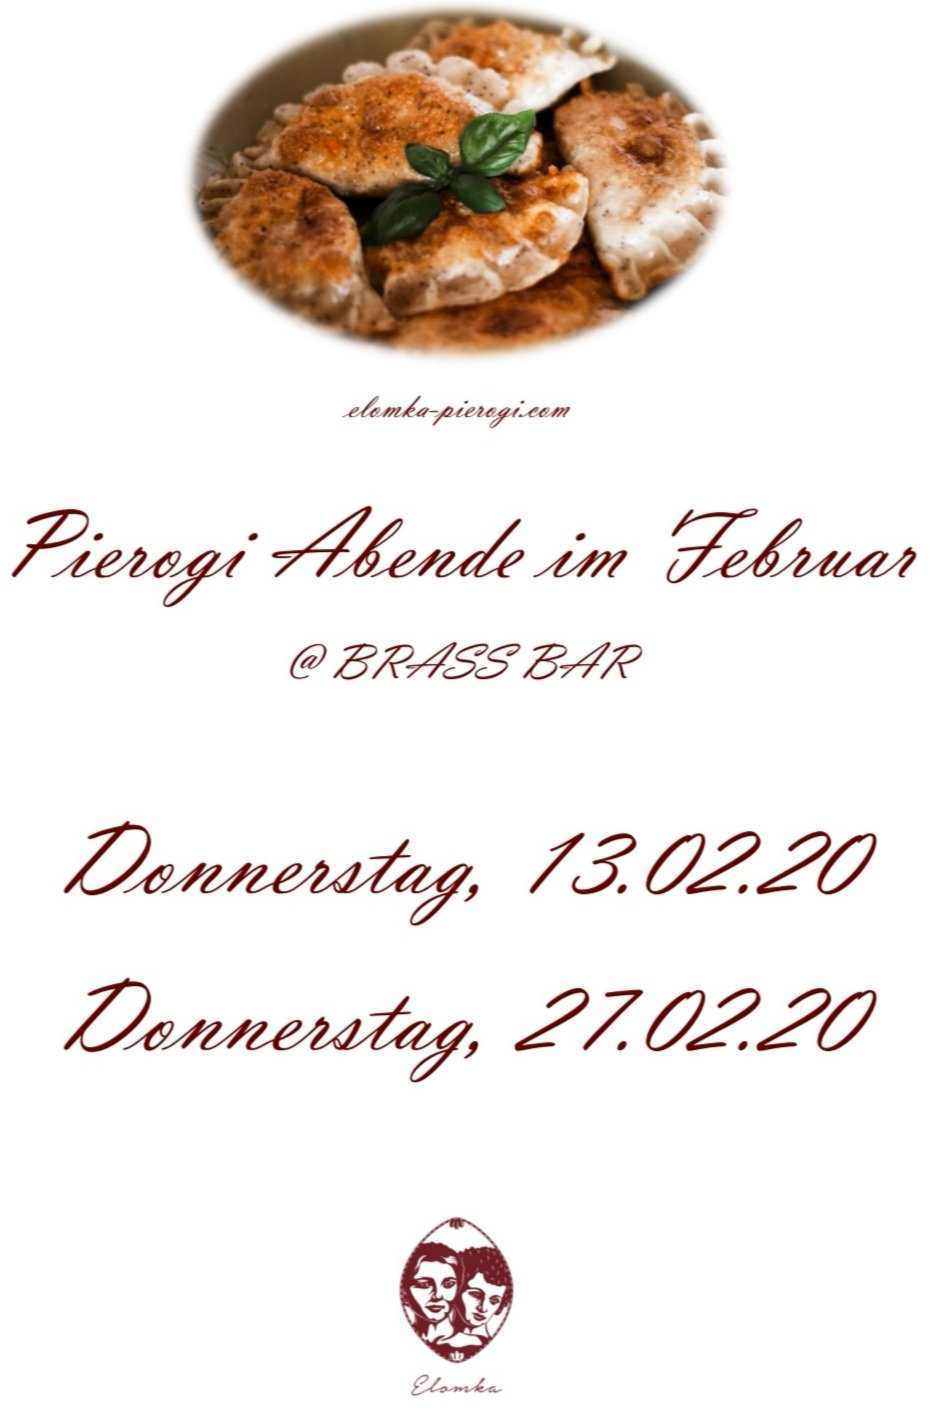 Pierogi Abende Düsseldorf